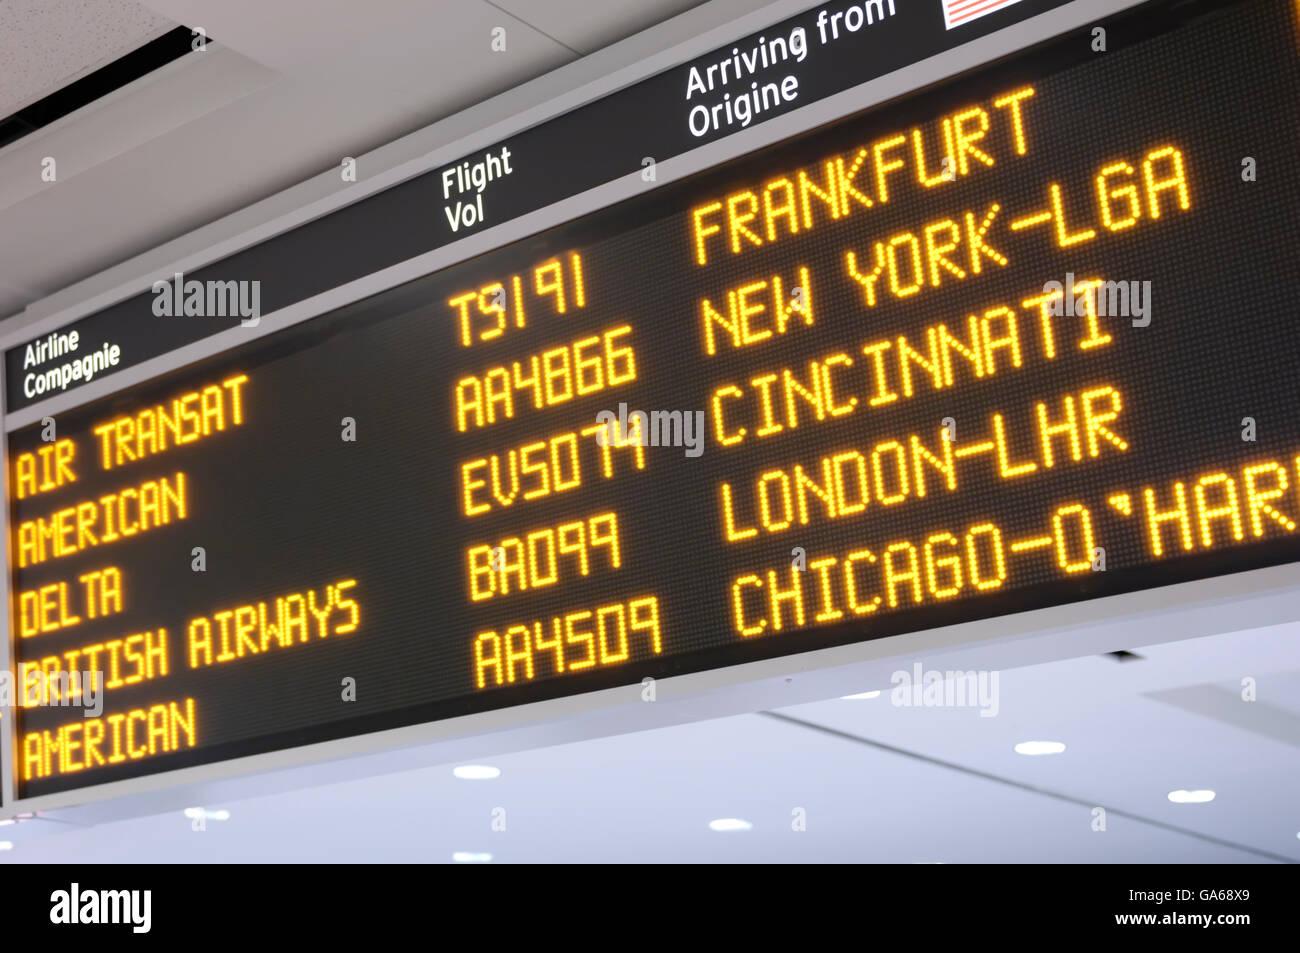 Ankünfte Board, Toronto Pearson International Airport, Toronto, Ontario, Kanada, Nordamerika Stockbild